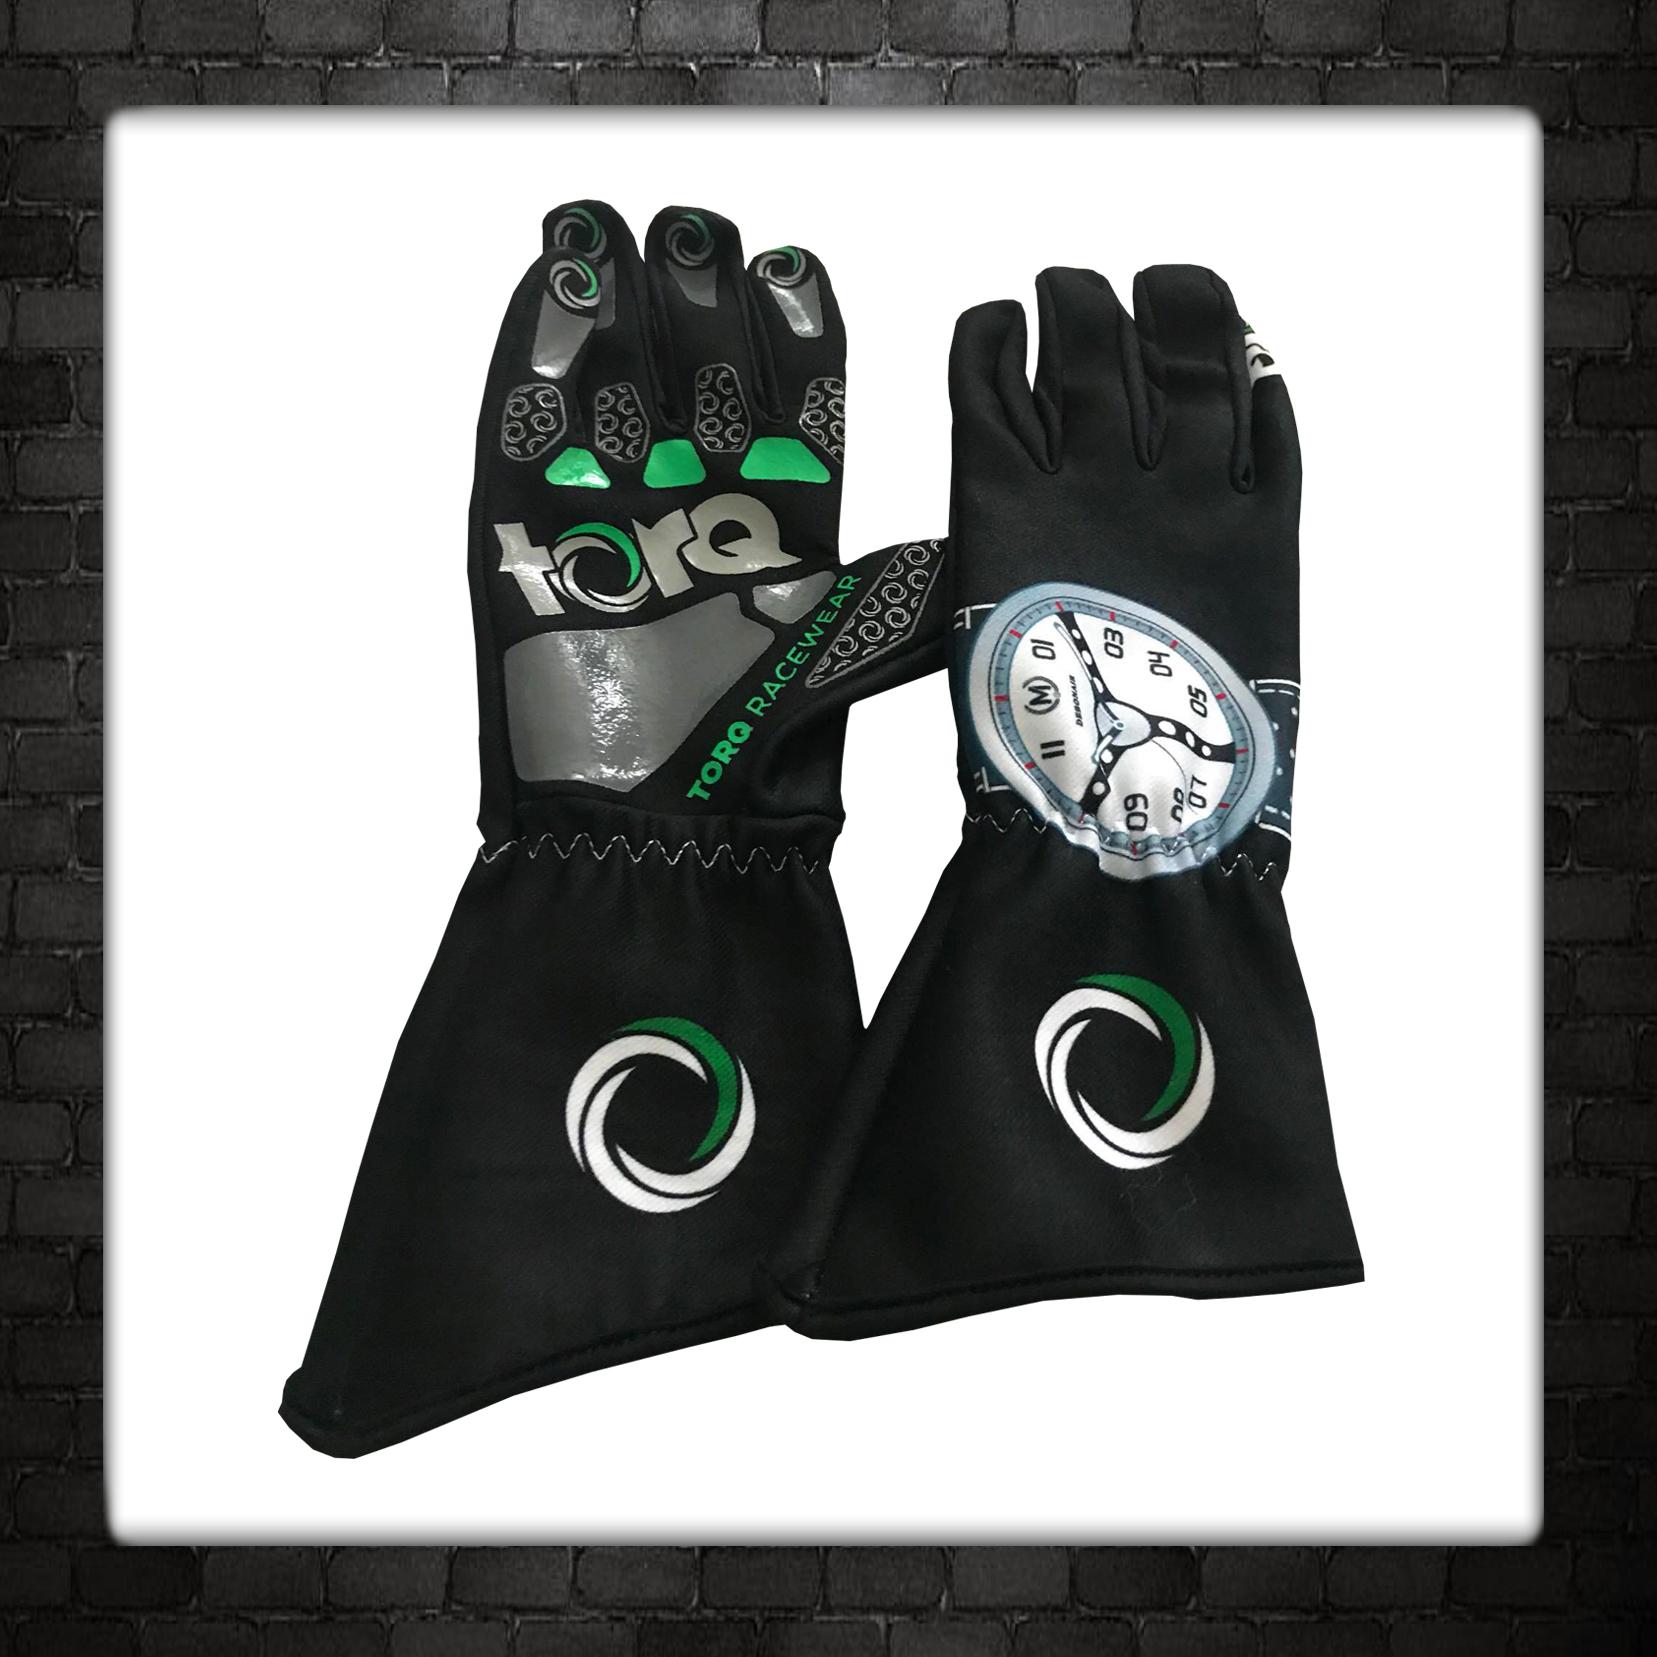 torq-gloves-black-watch.jpg